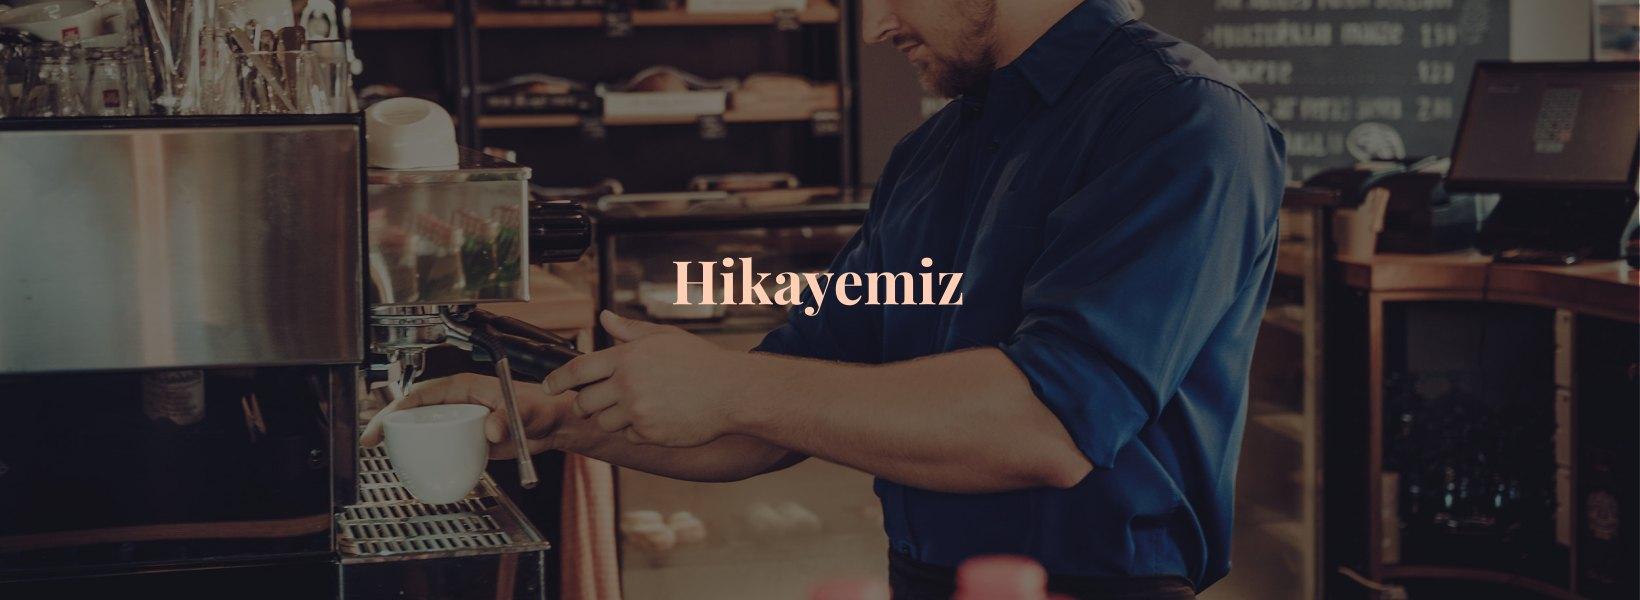 anisah-coffee-hikayemiz